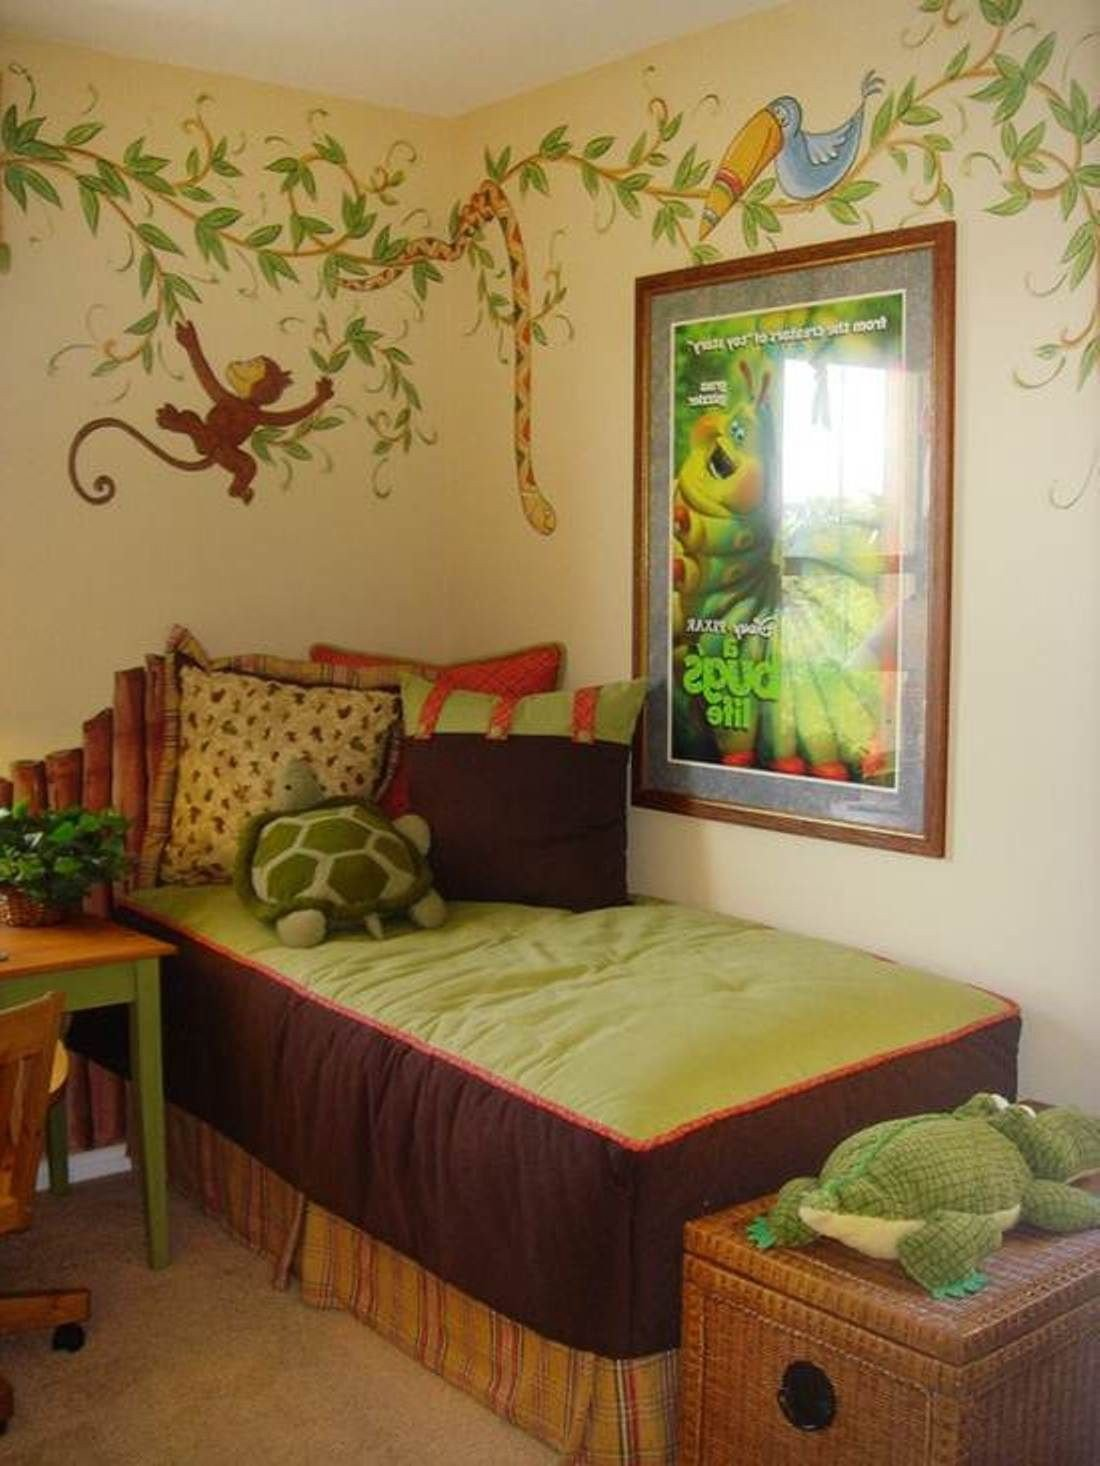 Little Boy Room Decor Ideas Luxury Jungle Little Boy Bedroom Ideas Awesome Little Boys Bedroom Ideas – Better Home and Garden